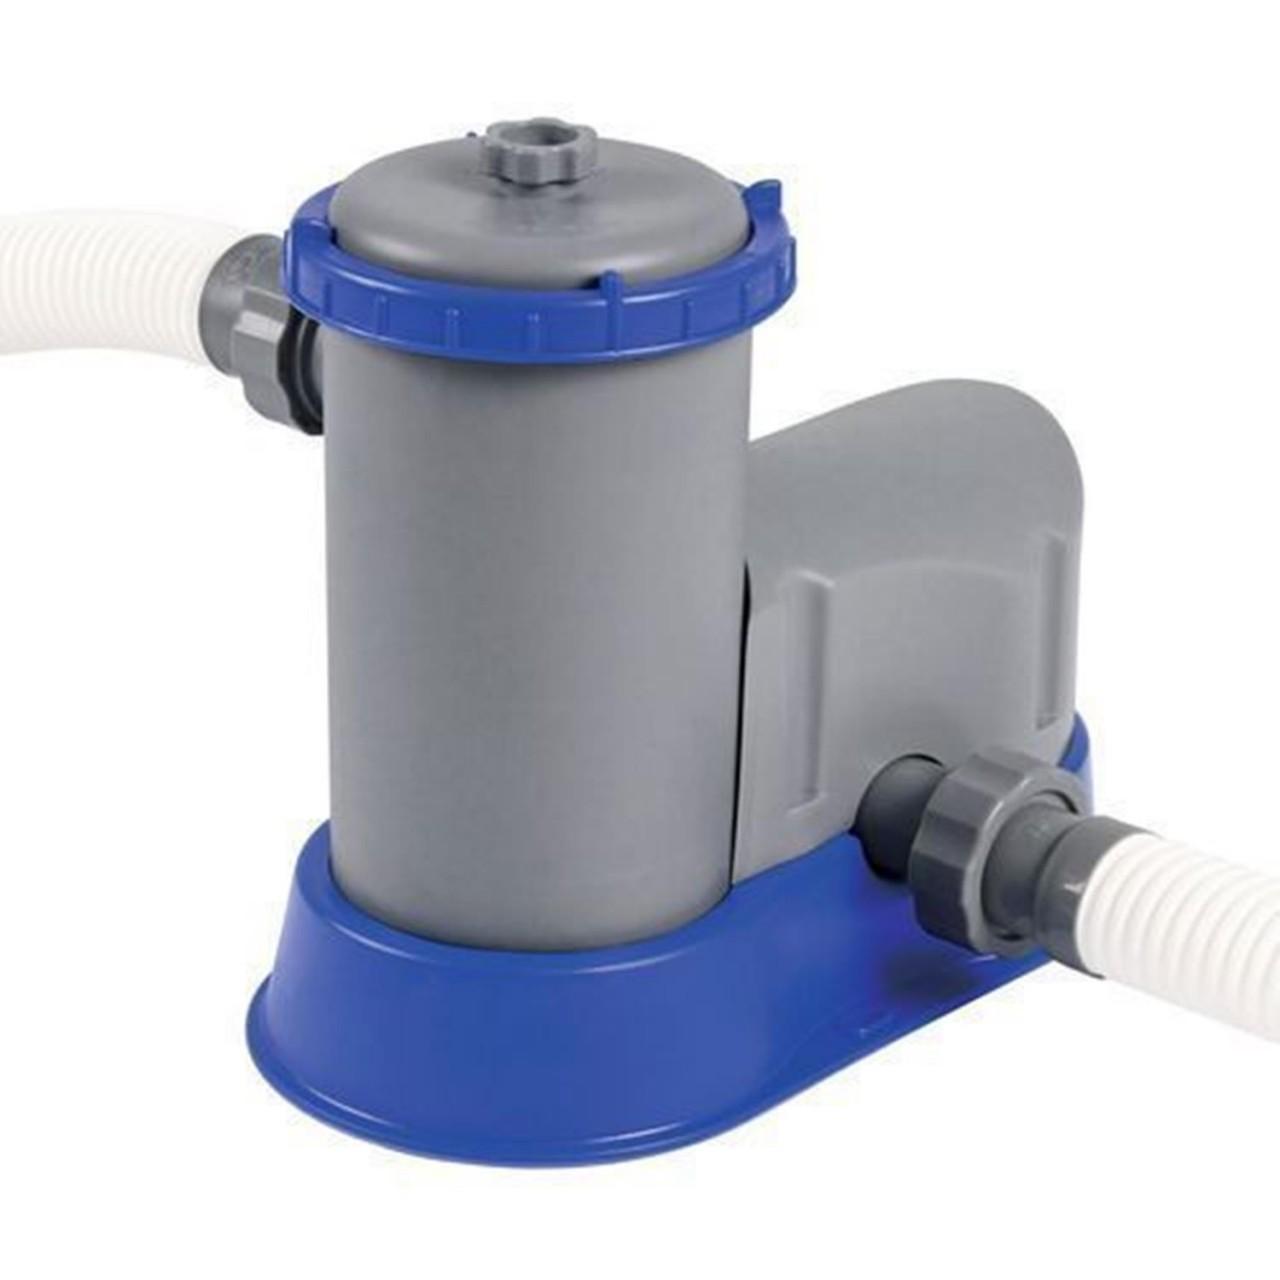 Bestway 58389 Filterpumpe Flowclear Poolreinigung + Filter Pumpleistung 5.678L/h